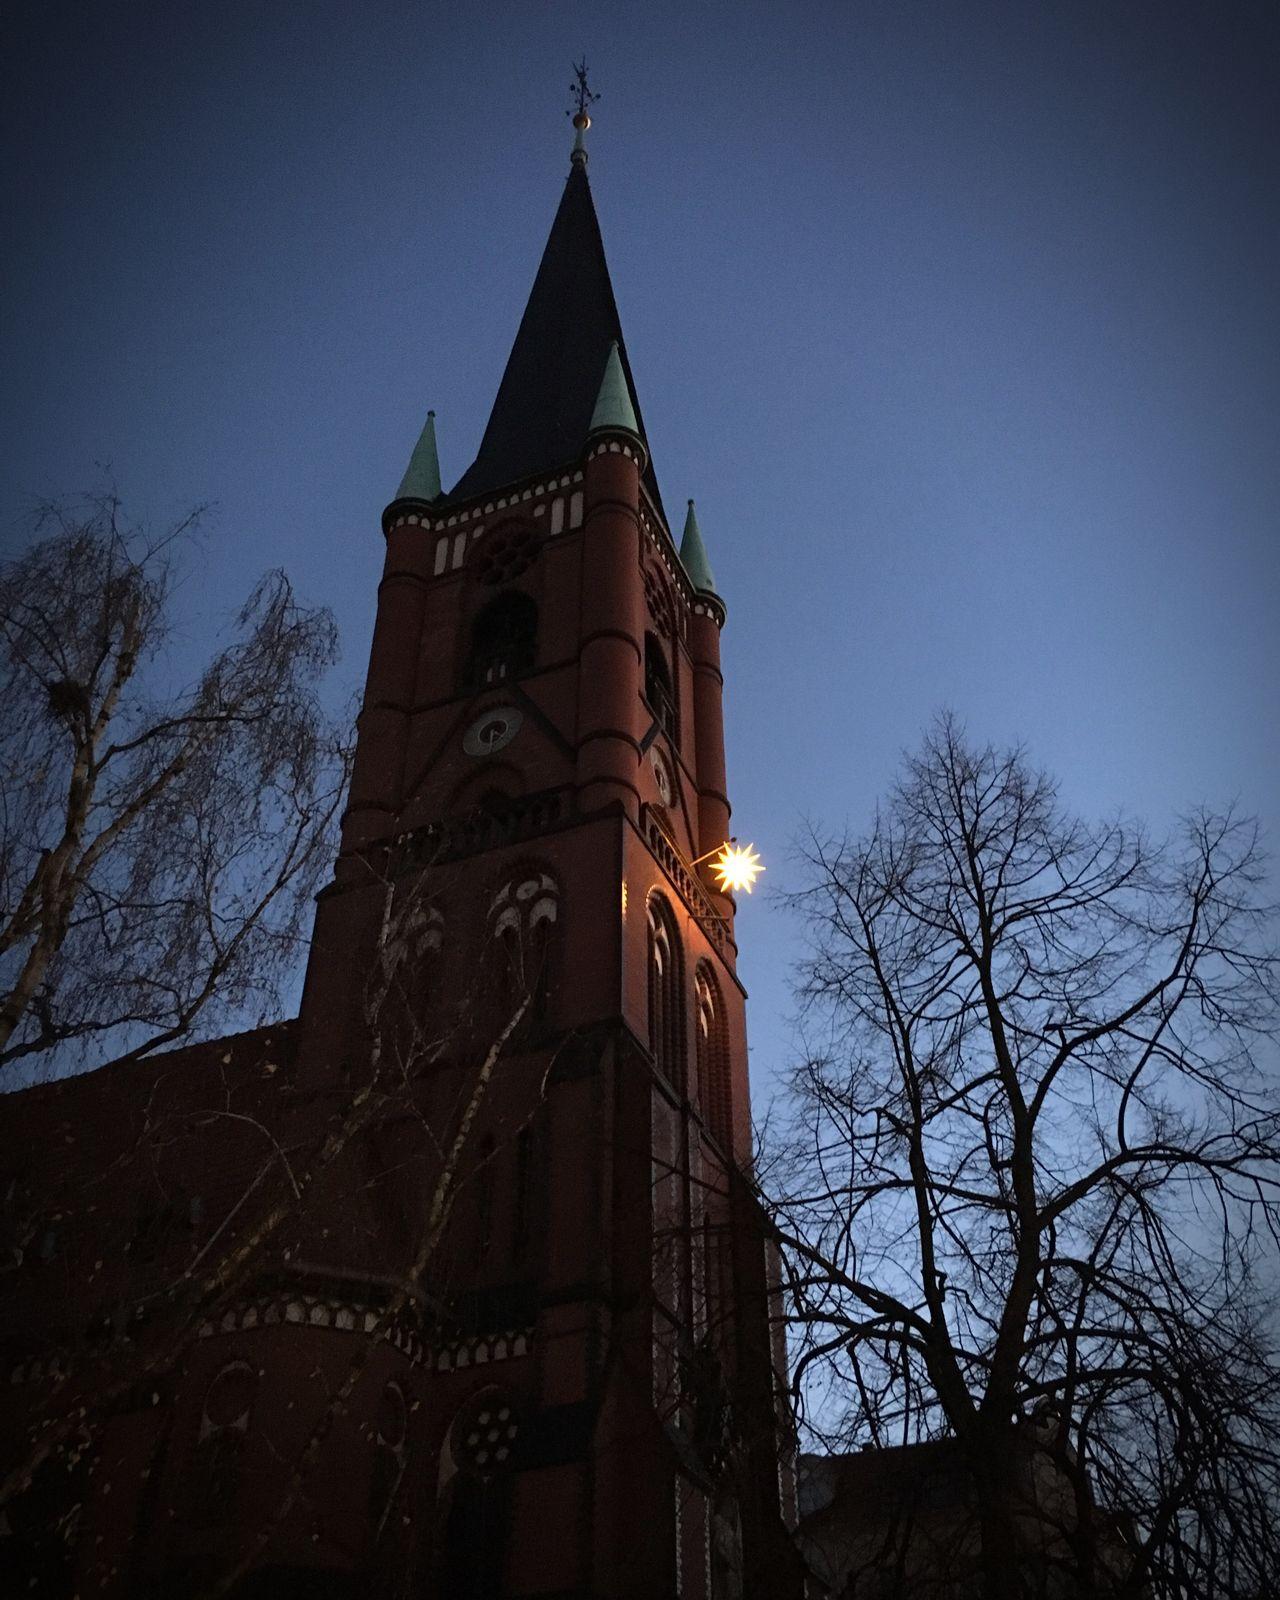 * Samariterkirche Berlin Friedrichshain Church Tree Evening Evening Sky No People Light Star Weihnachtsstern Advent